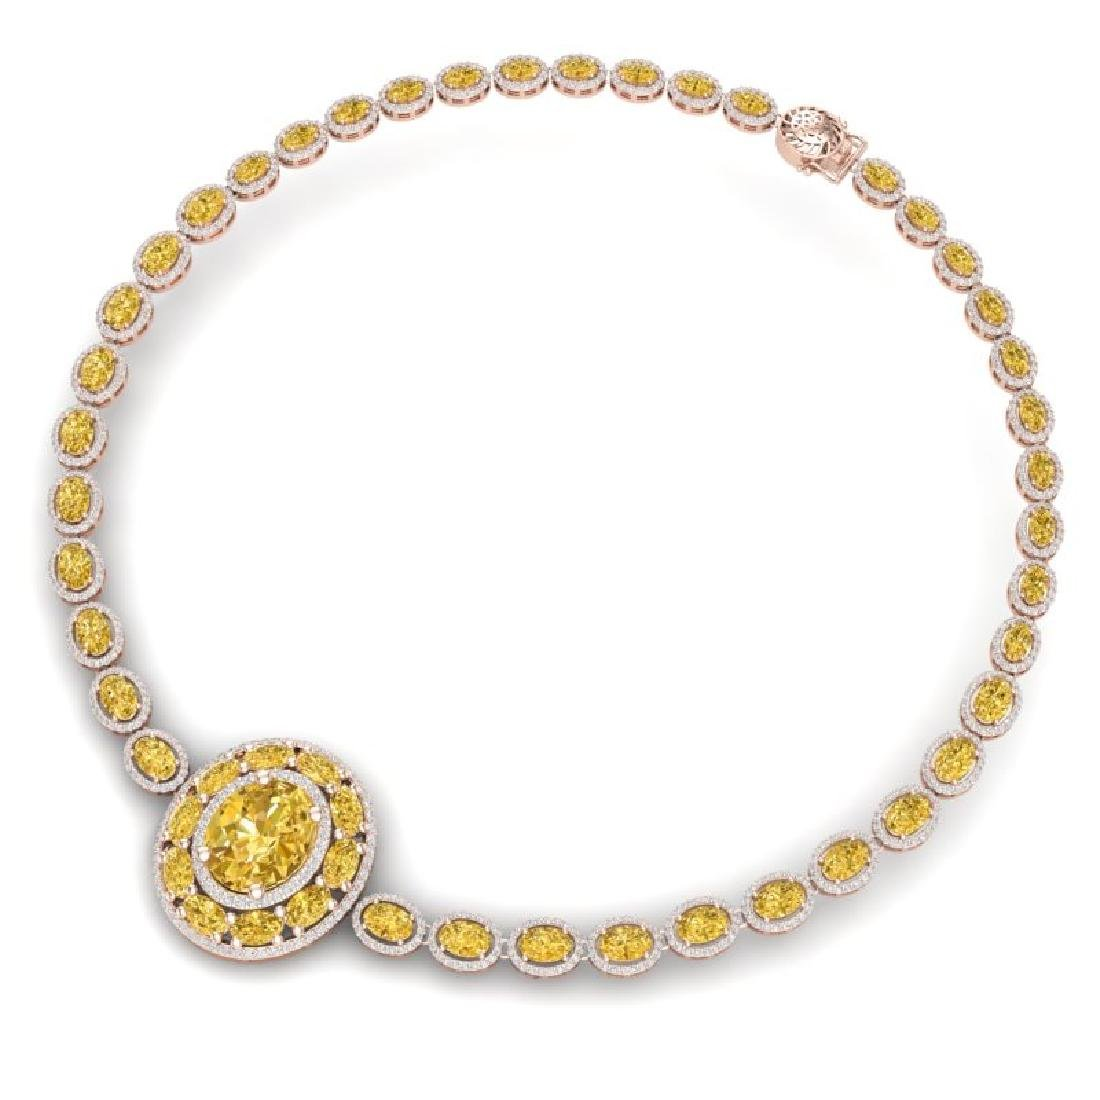 39.04 CTW Royalty Canary Citrine & VS Diamond Necklace - 3